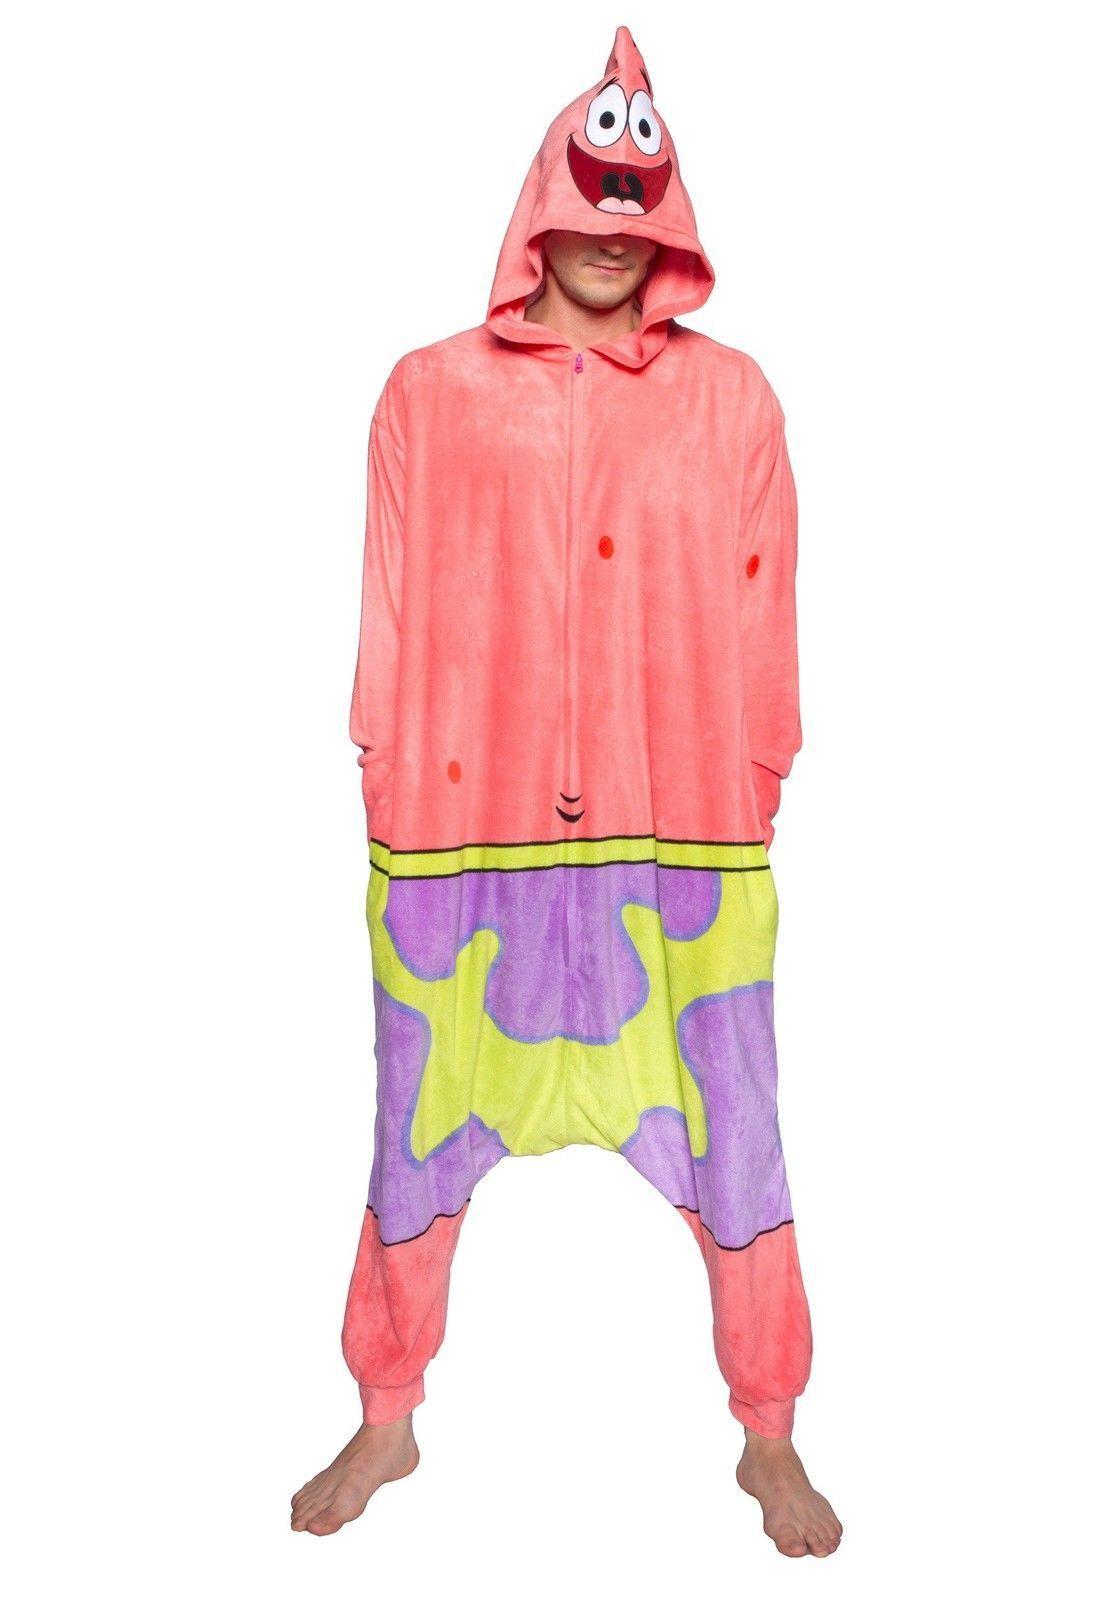 c069808ae9 SpongeBob Patrick Onesie For Adults. SpongeBob Patrick Onesie For Adults  Pijamas Divertidos